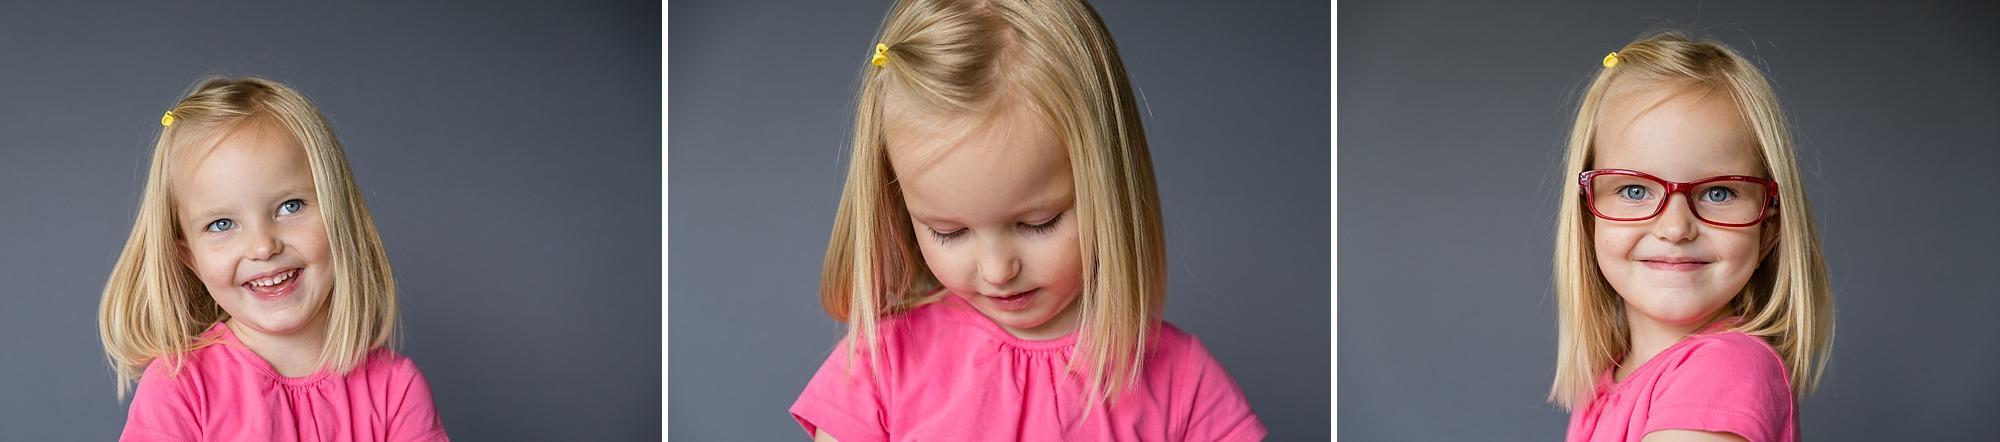 Modern_Childrens_Portraits_Hunnicutt_Photography_Collages_0004